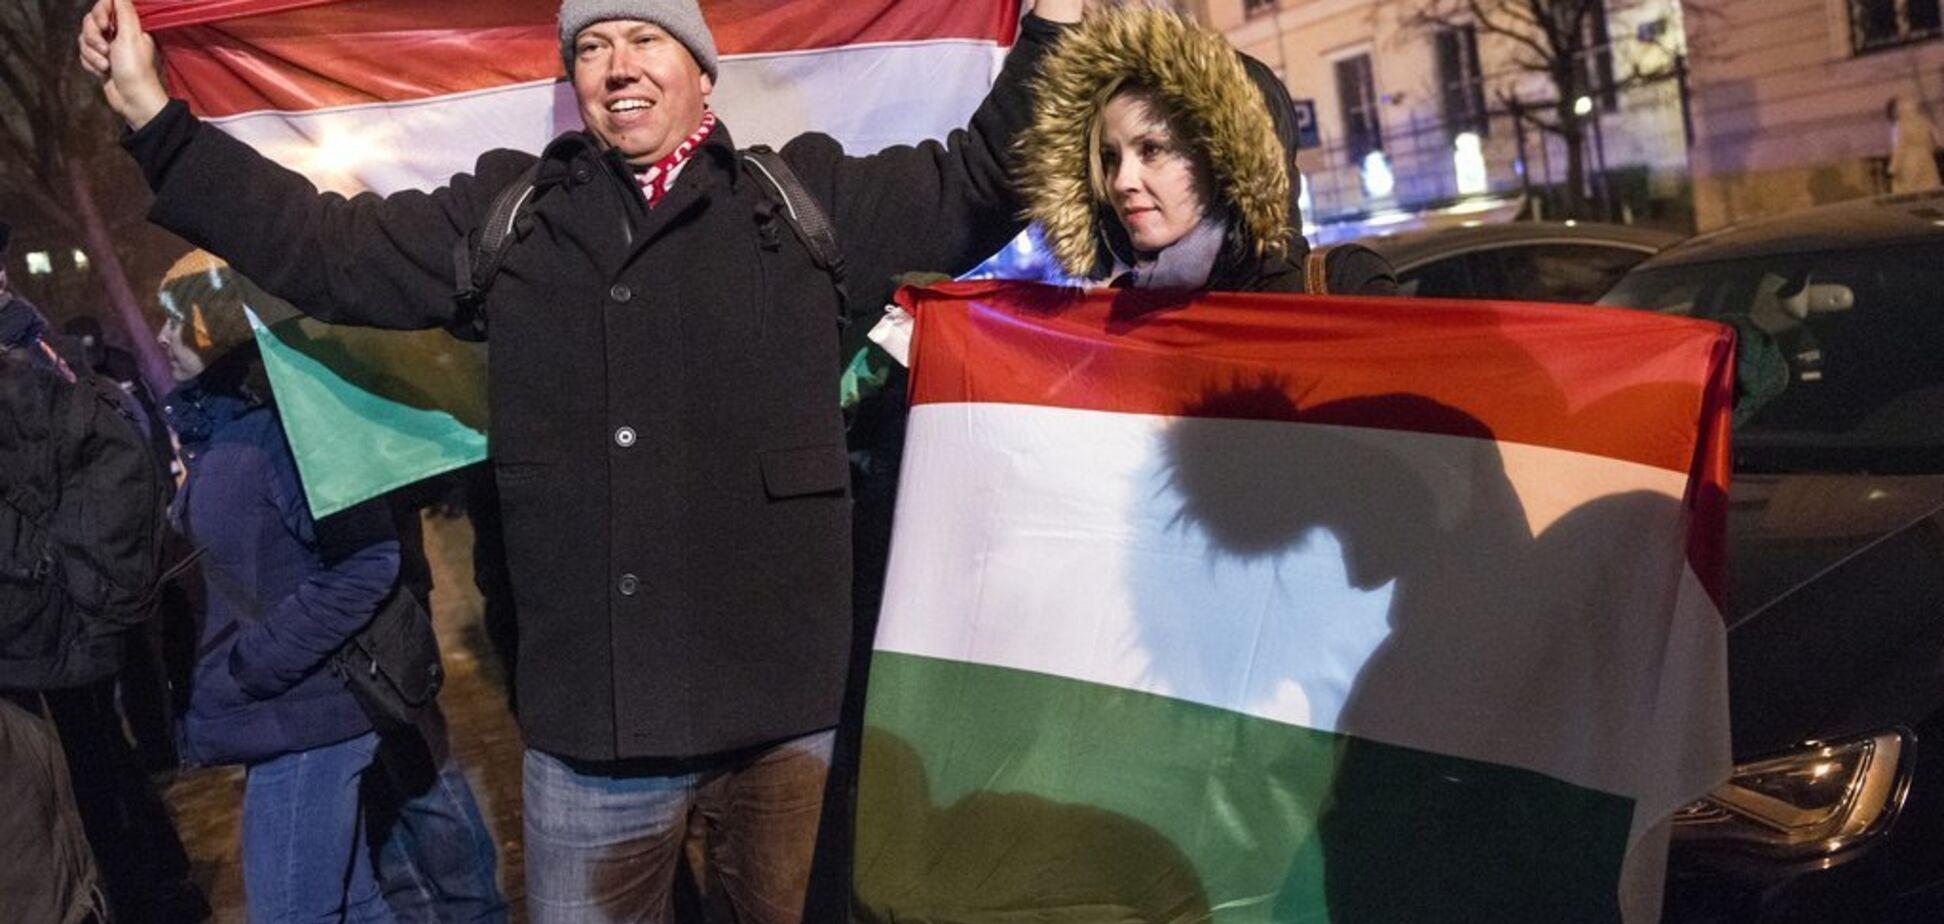 ''Рабський закон!'' Угорщину охопили протести проти влади, яка нападала на Україну